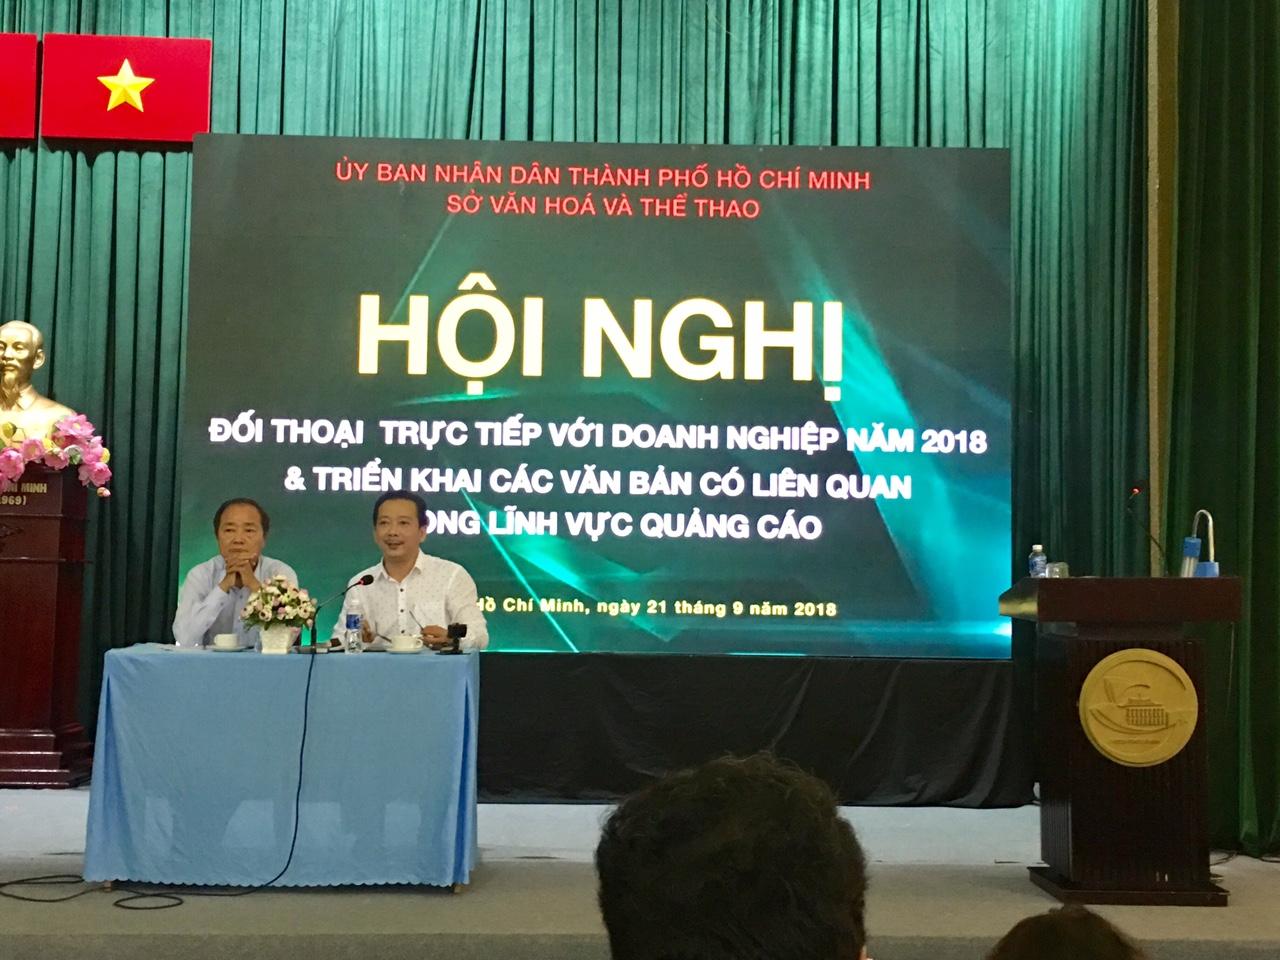 hoi-nghi-doi-thoai-doanh-nghiep-2018-1